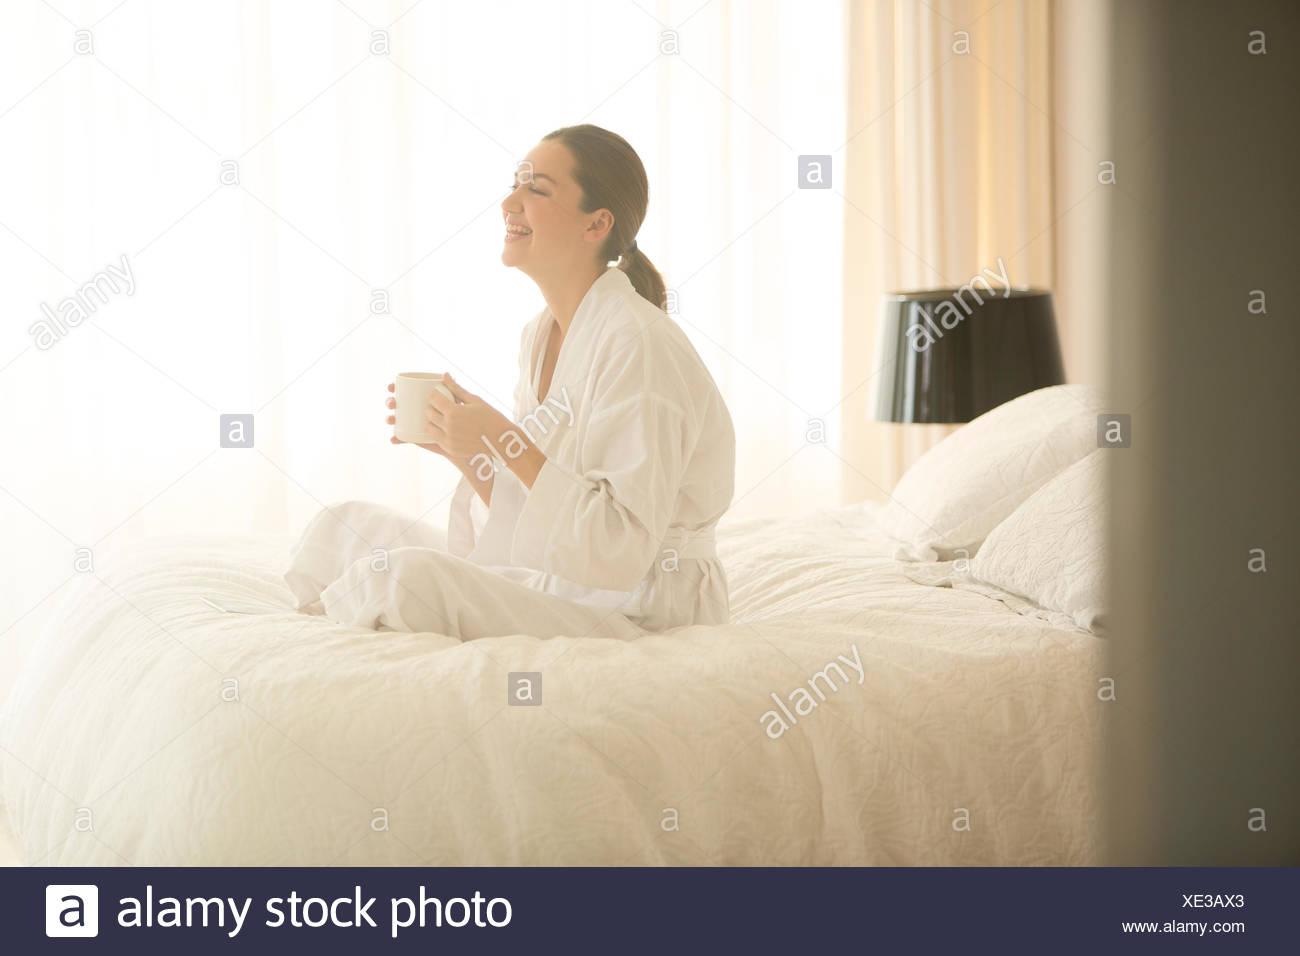 Smiling woman in bathrobe drinking coffee cross-legged on bed - Stock Image